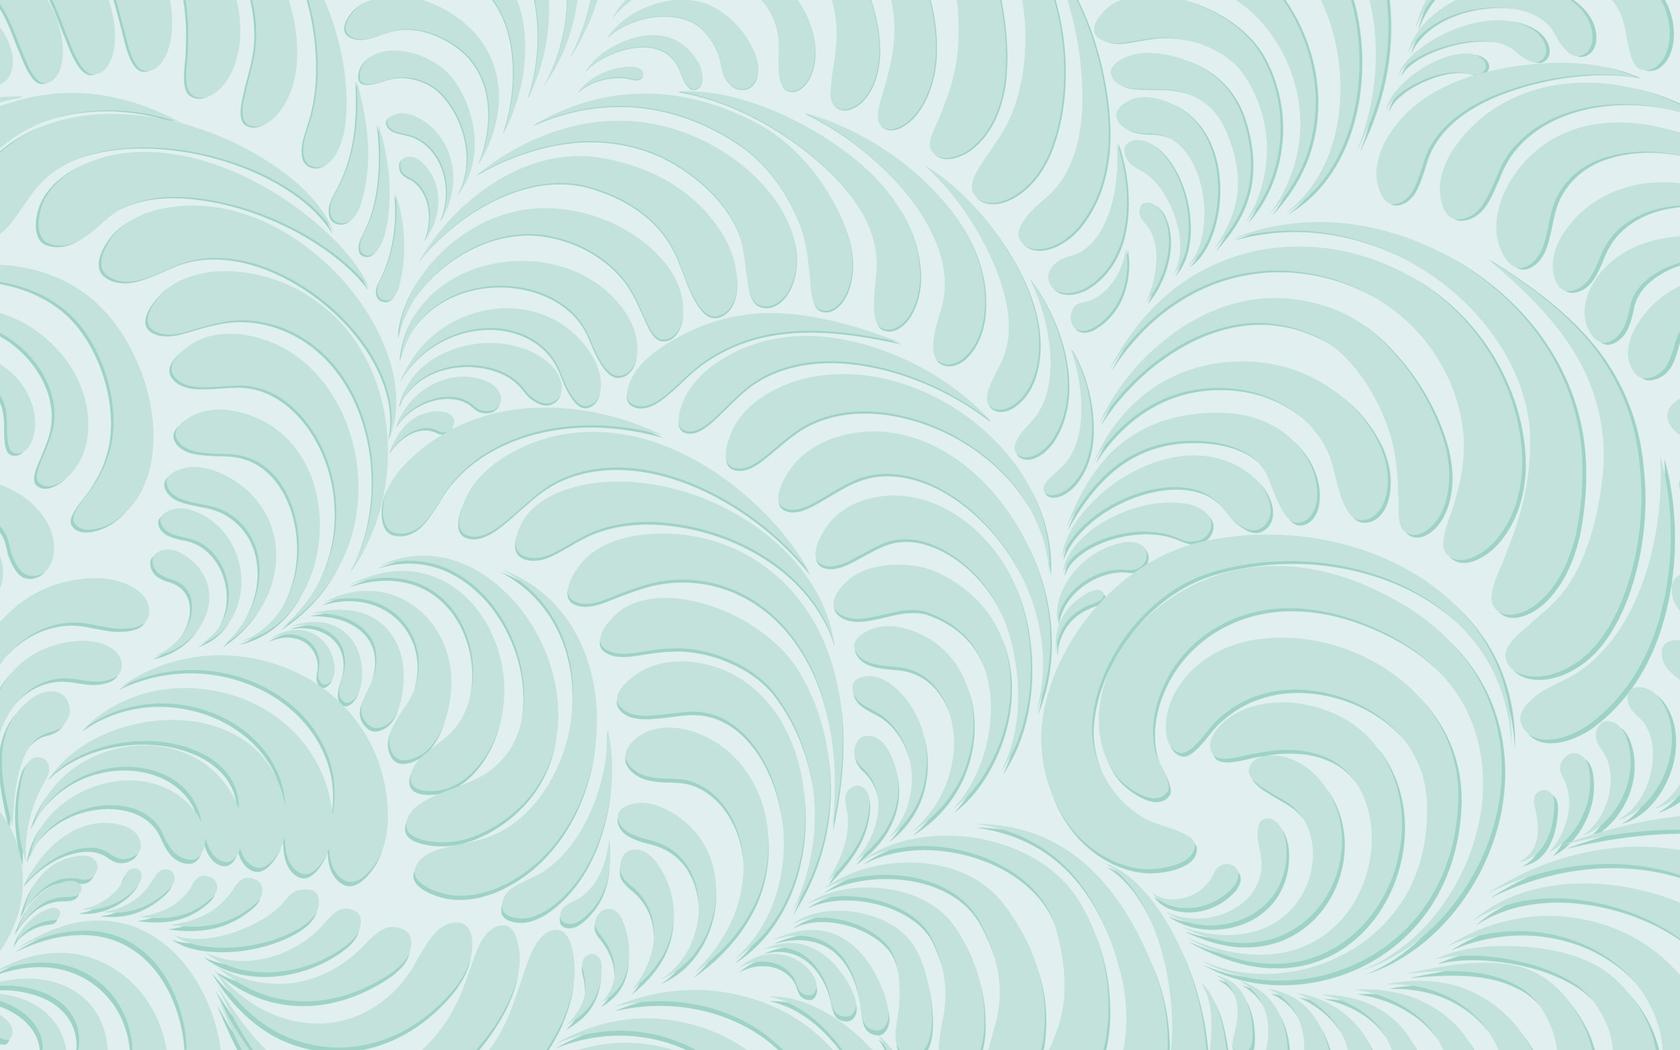 Wallpaper Pattern Background Light Lines Waves